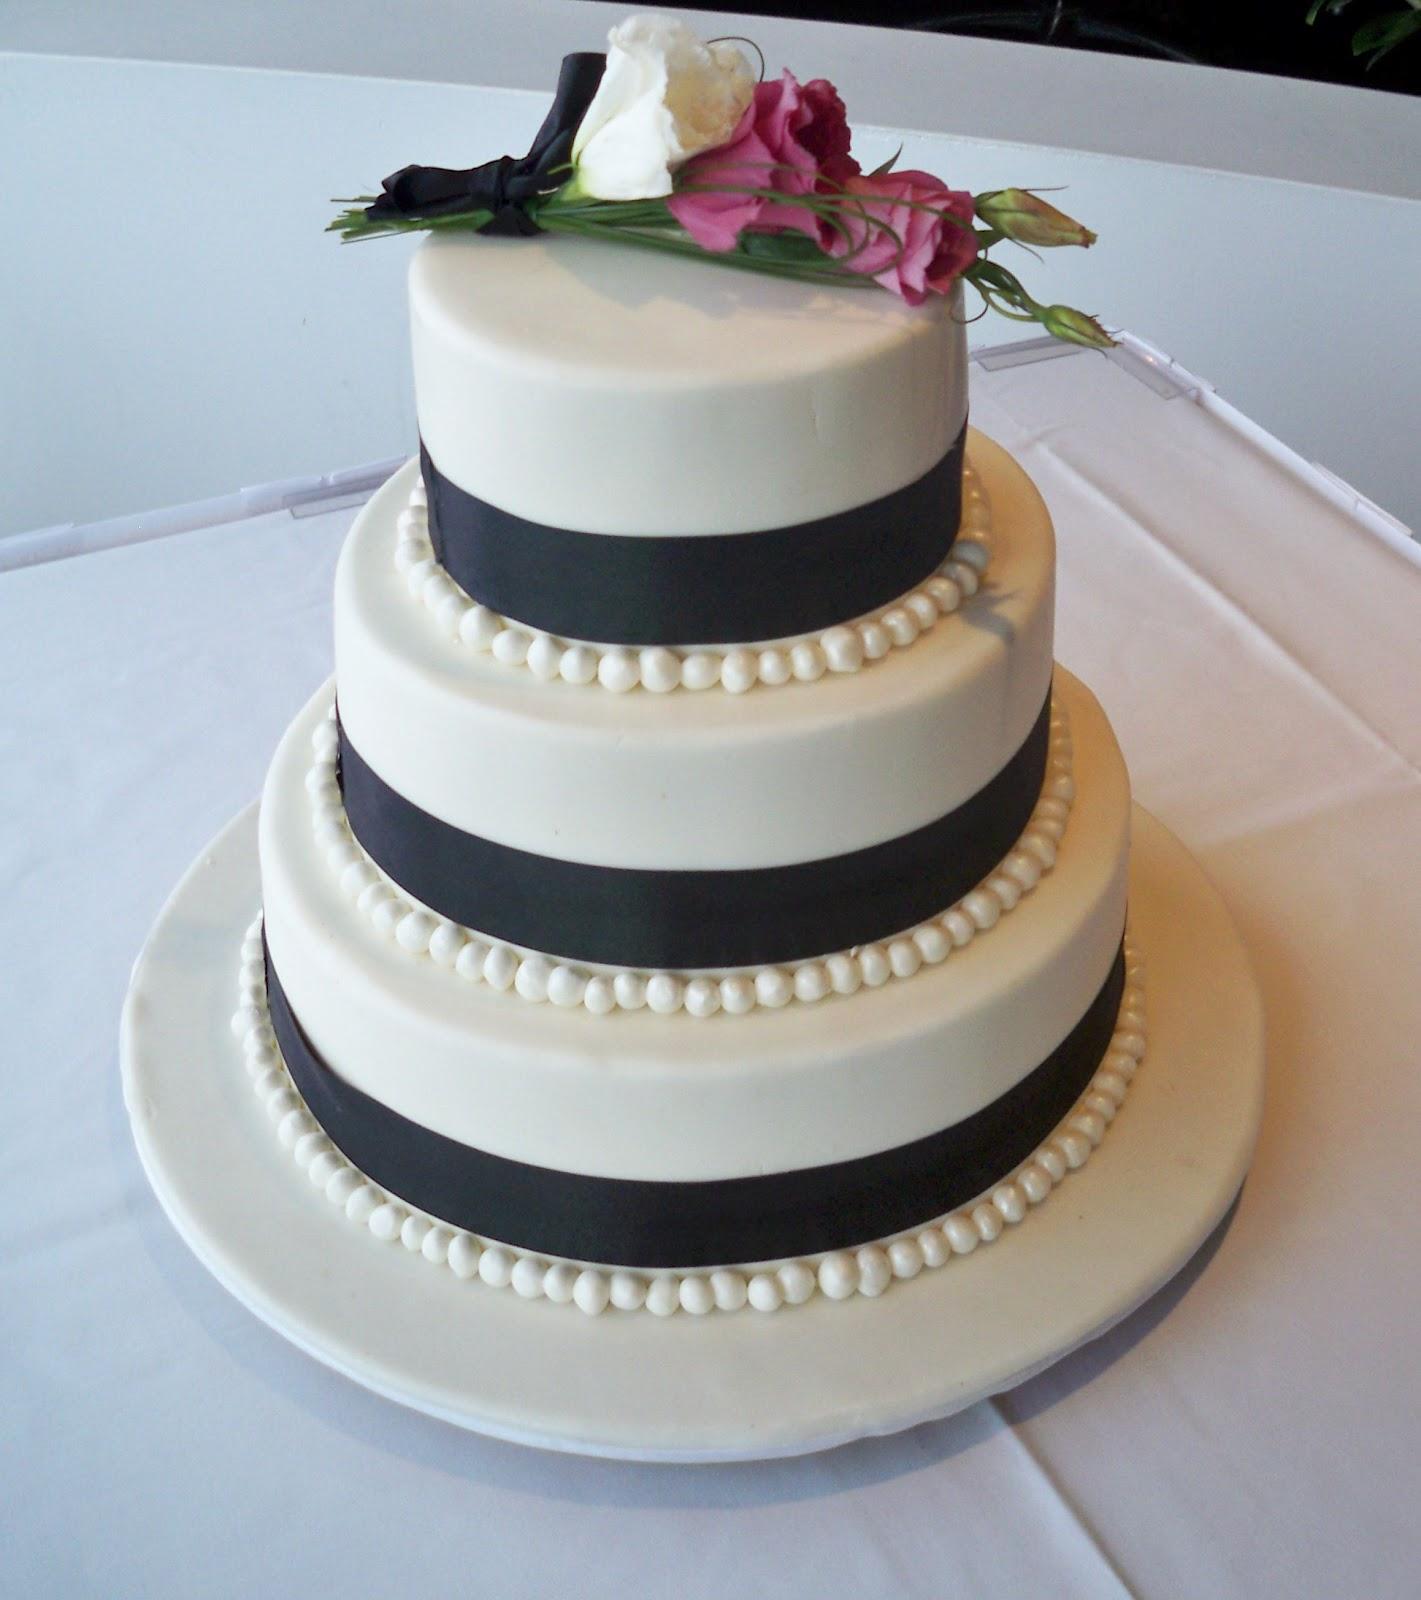 black and white 3 tier round wedding cake | Elisabeth\'s Wedding Cakes